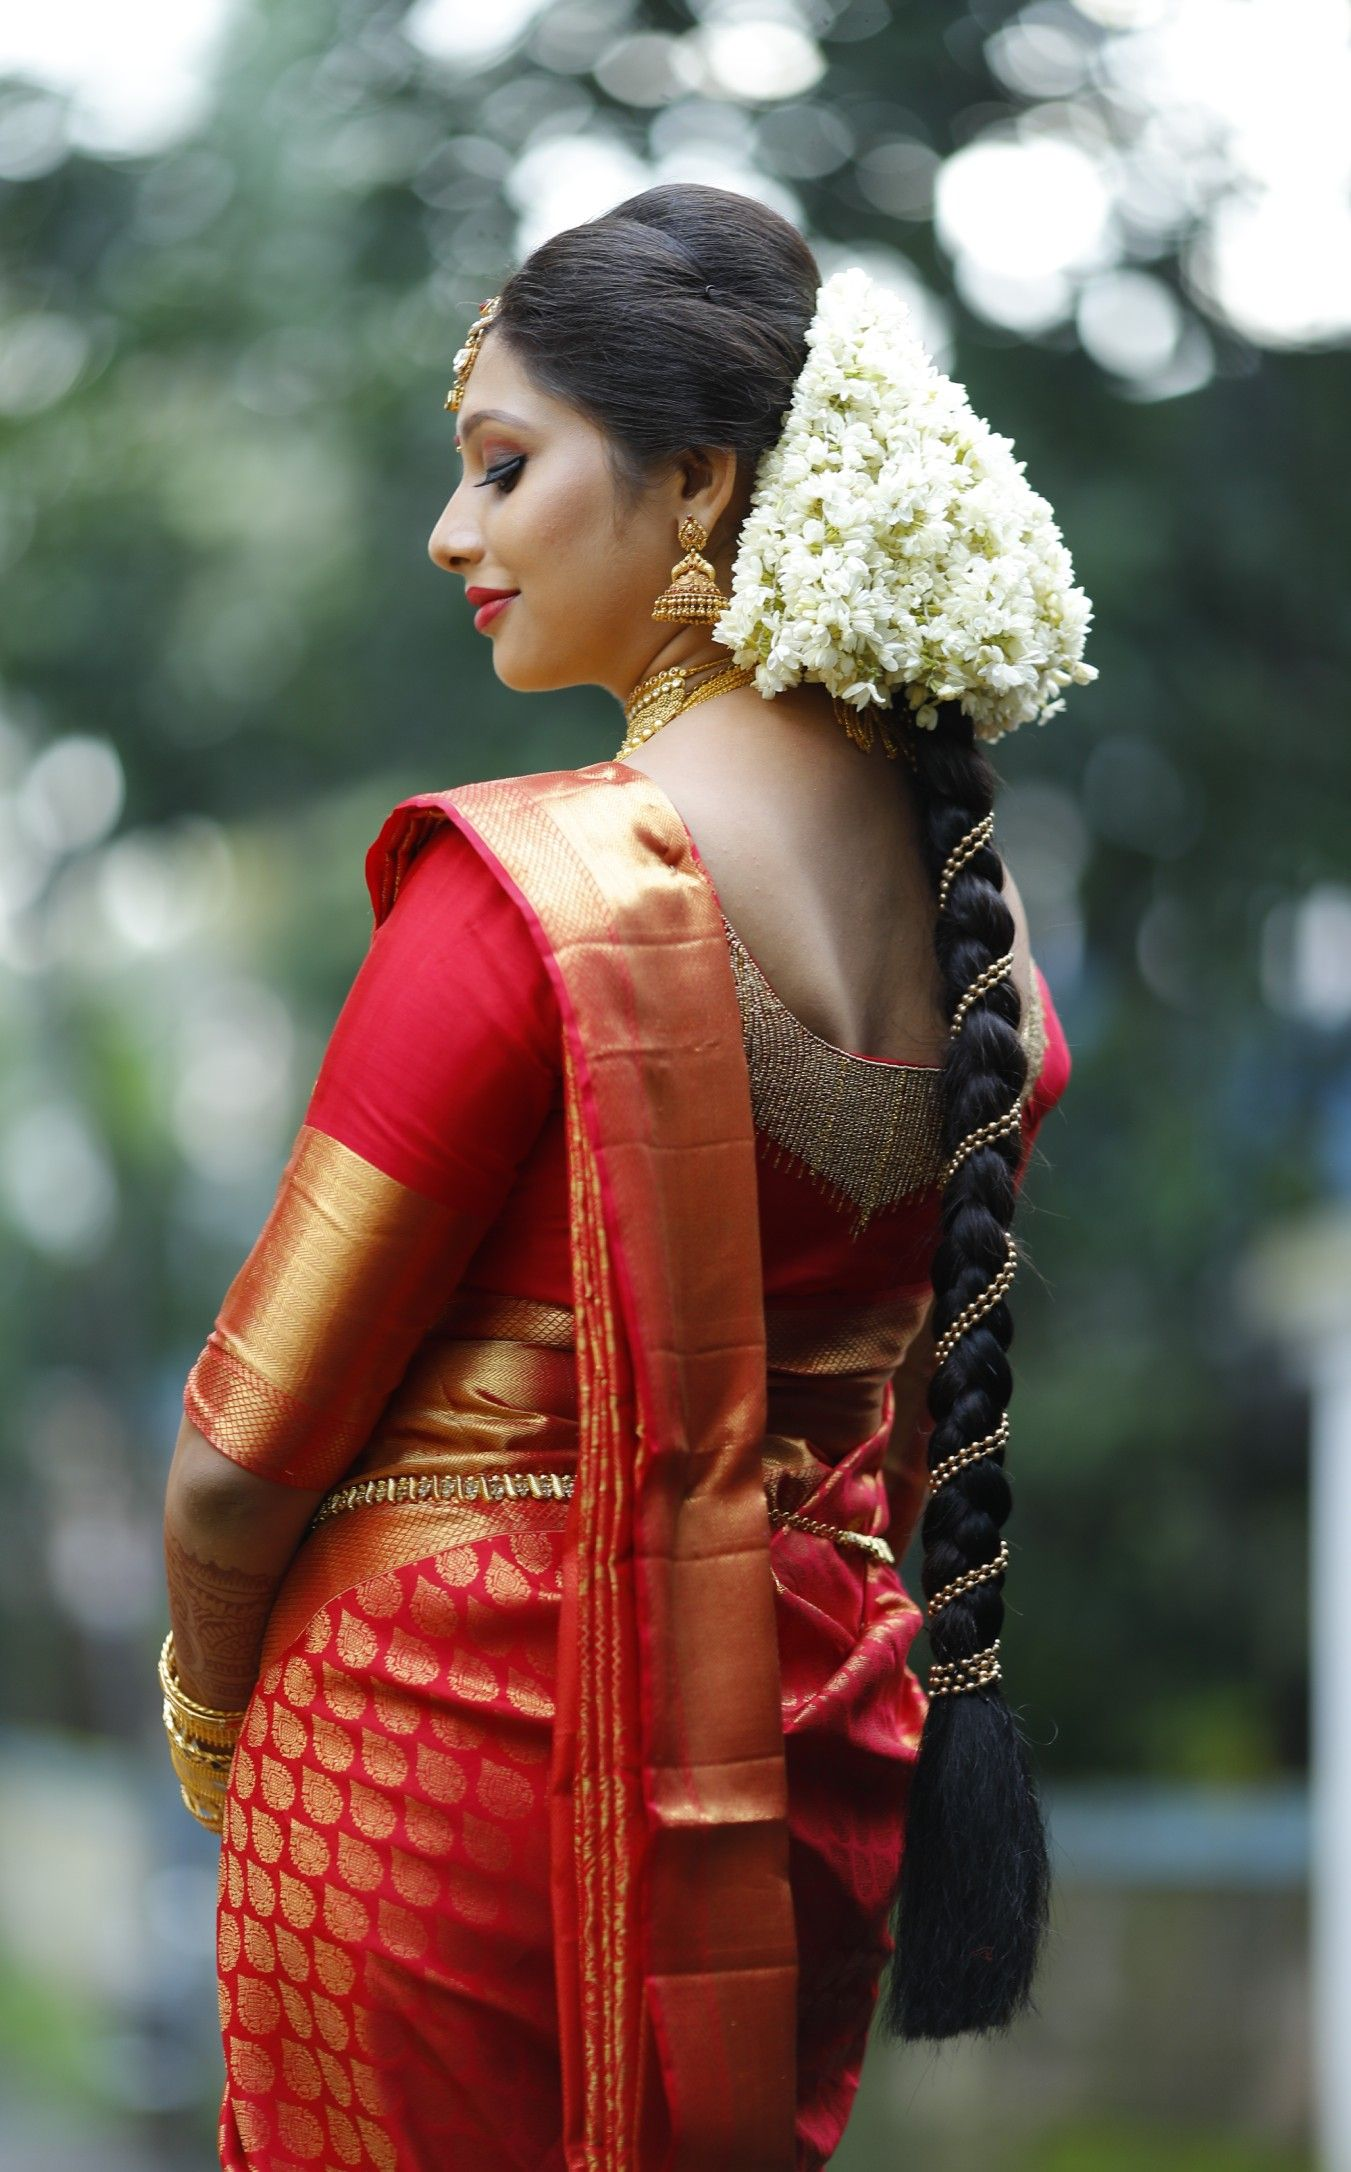 Pin by Krishnendhu on Kerala Hindu brides Bridal